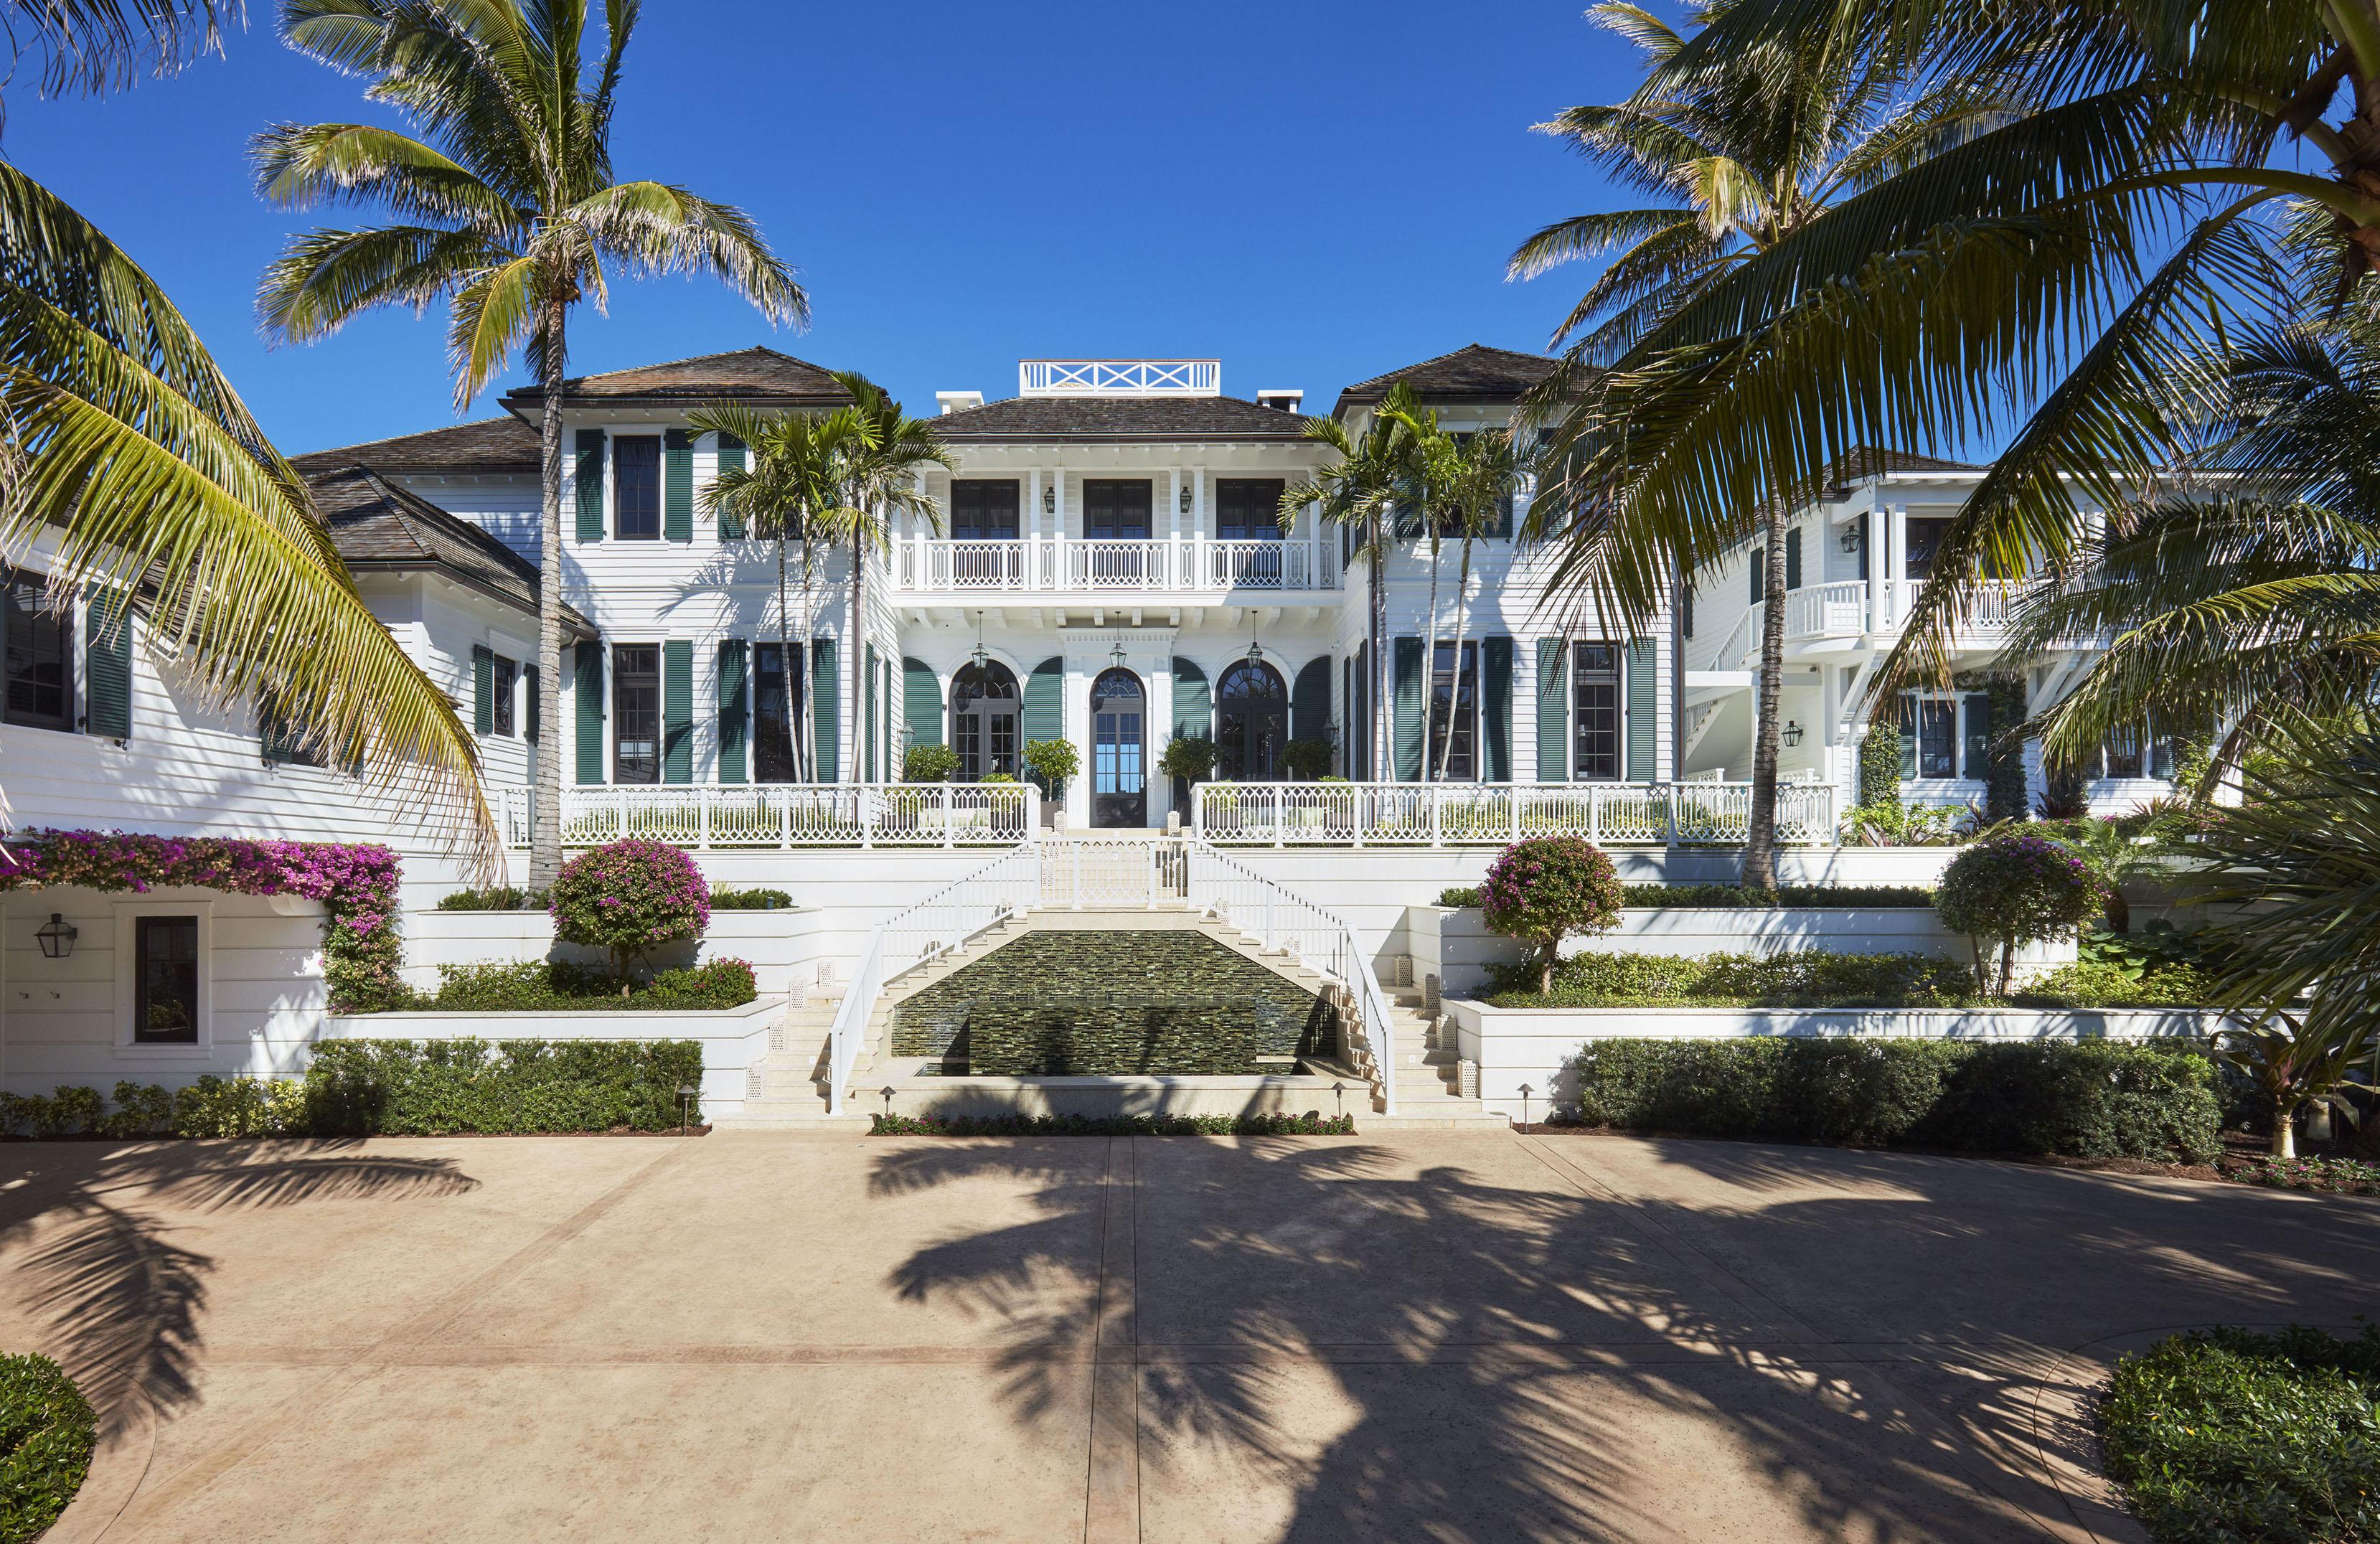 Elin Nordegren's stunning Florida mansion has 11 bedrooms